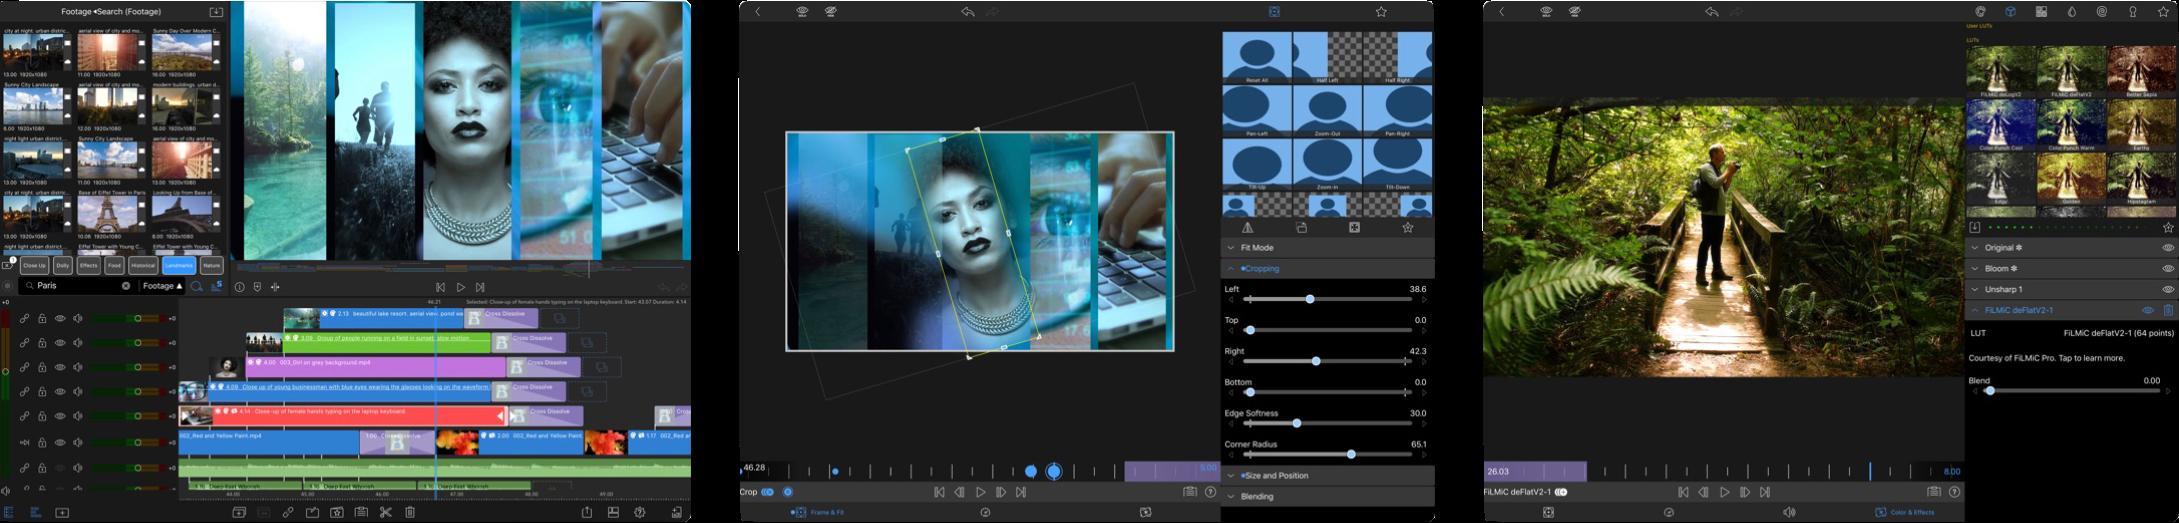 Video Editing App LumaFusion 2.0 On Sale for $14.99